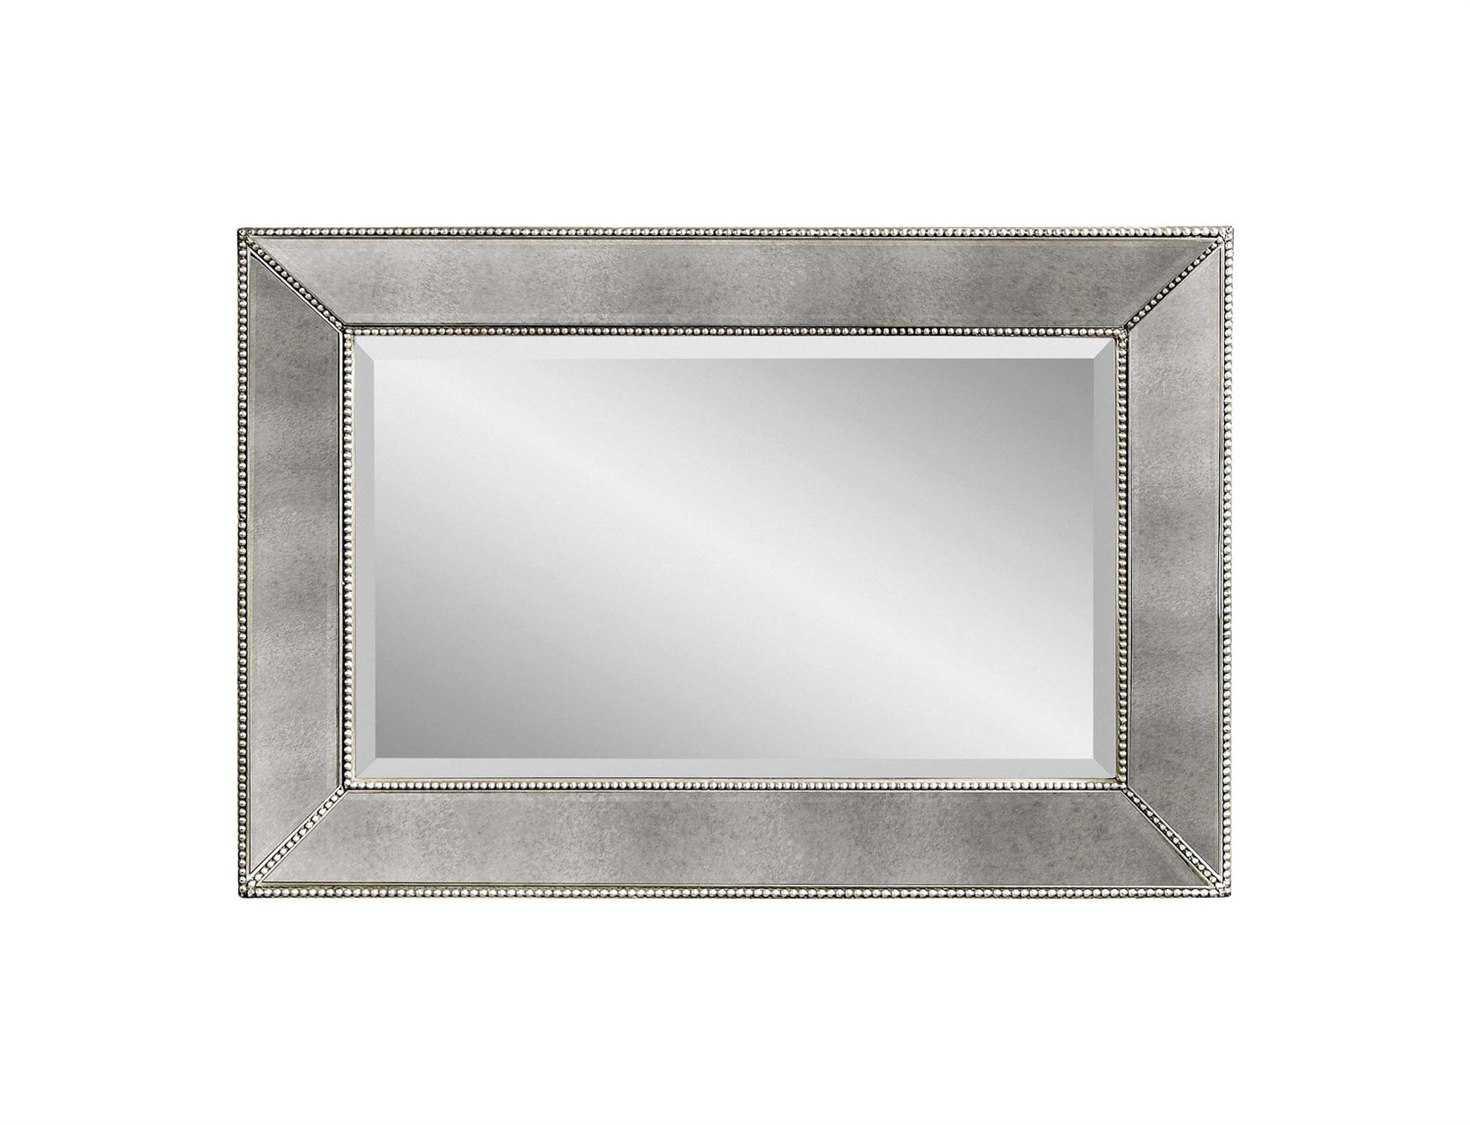 Bassett Mirror Hollywood Glam 36 X 24 Antique Silver